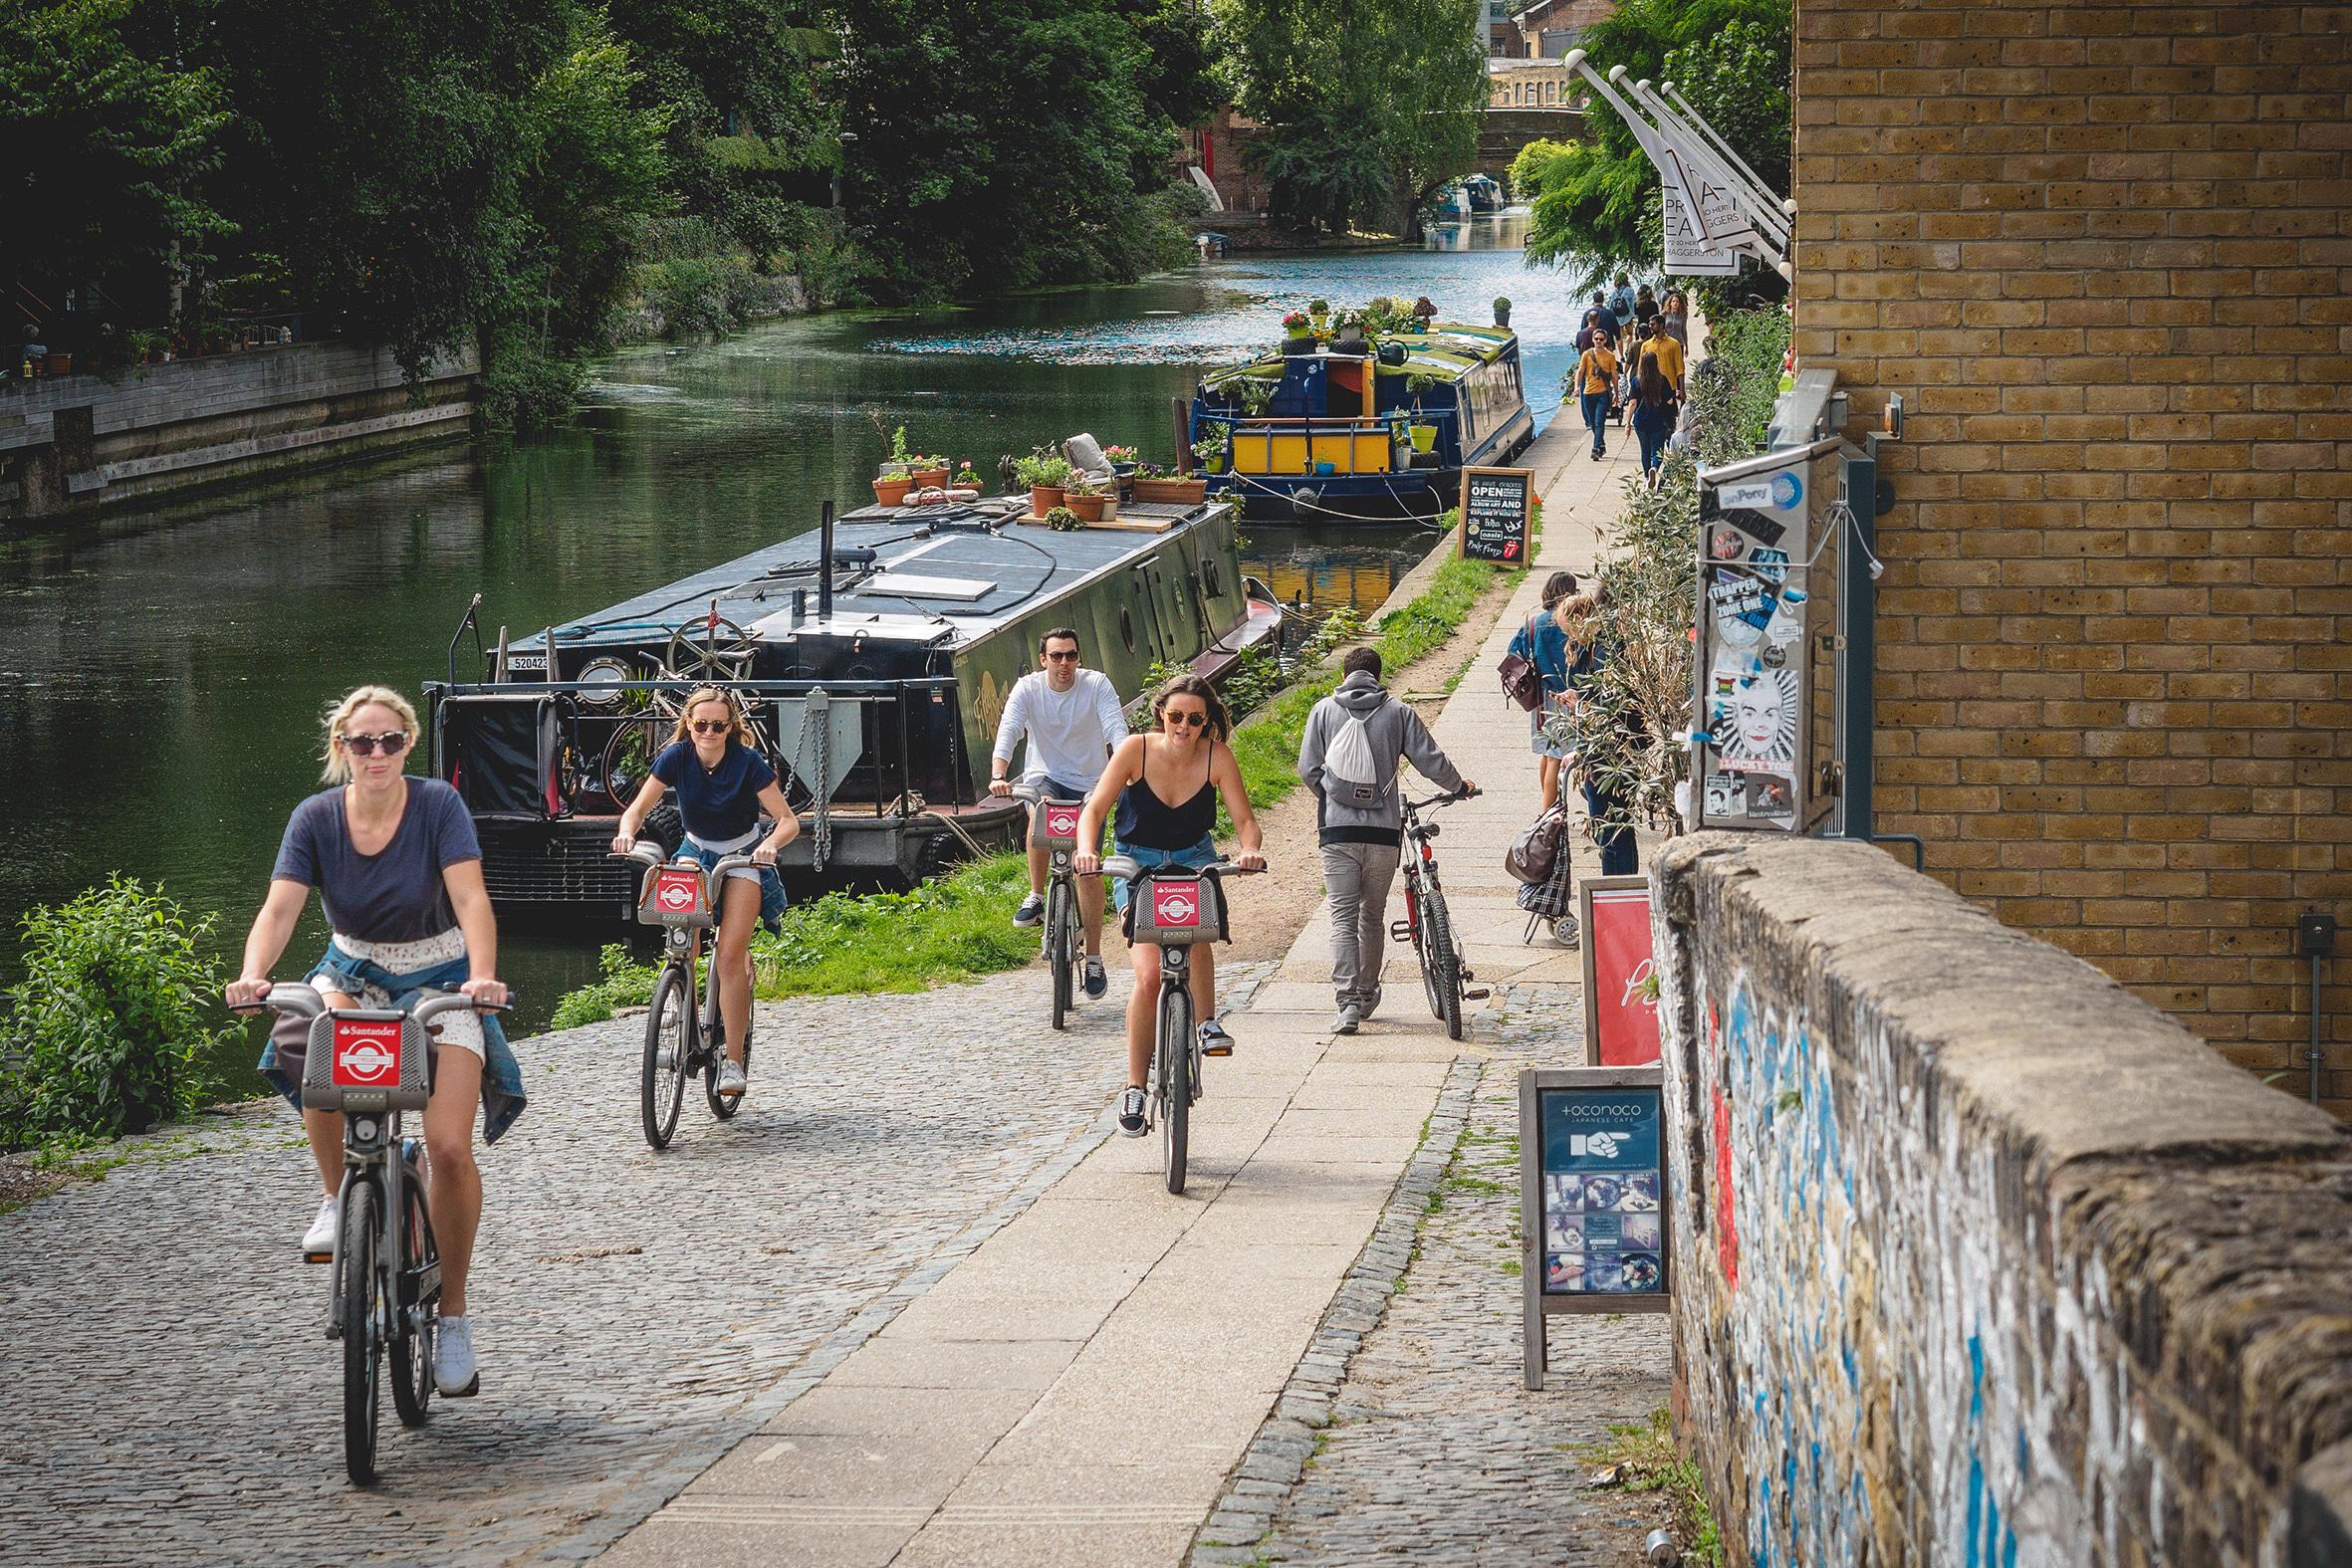 Regents Canal walk, Haggerston